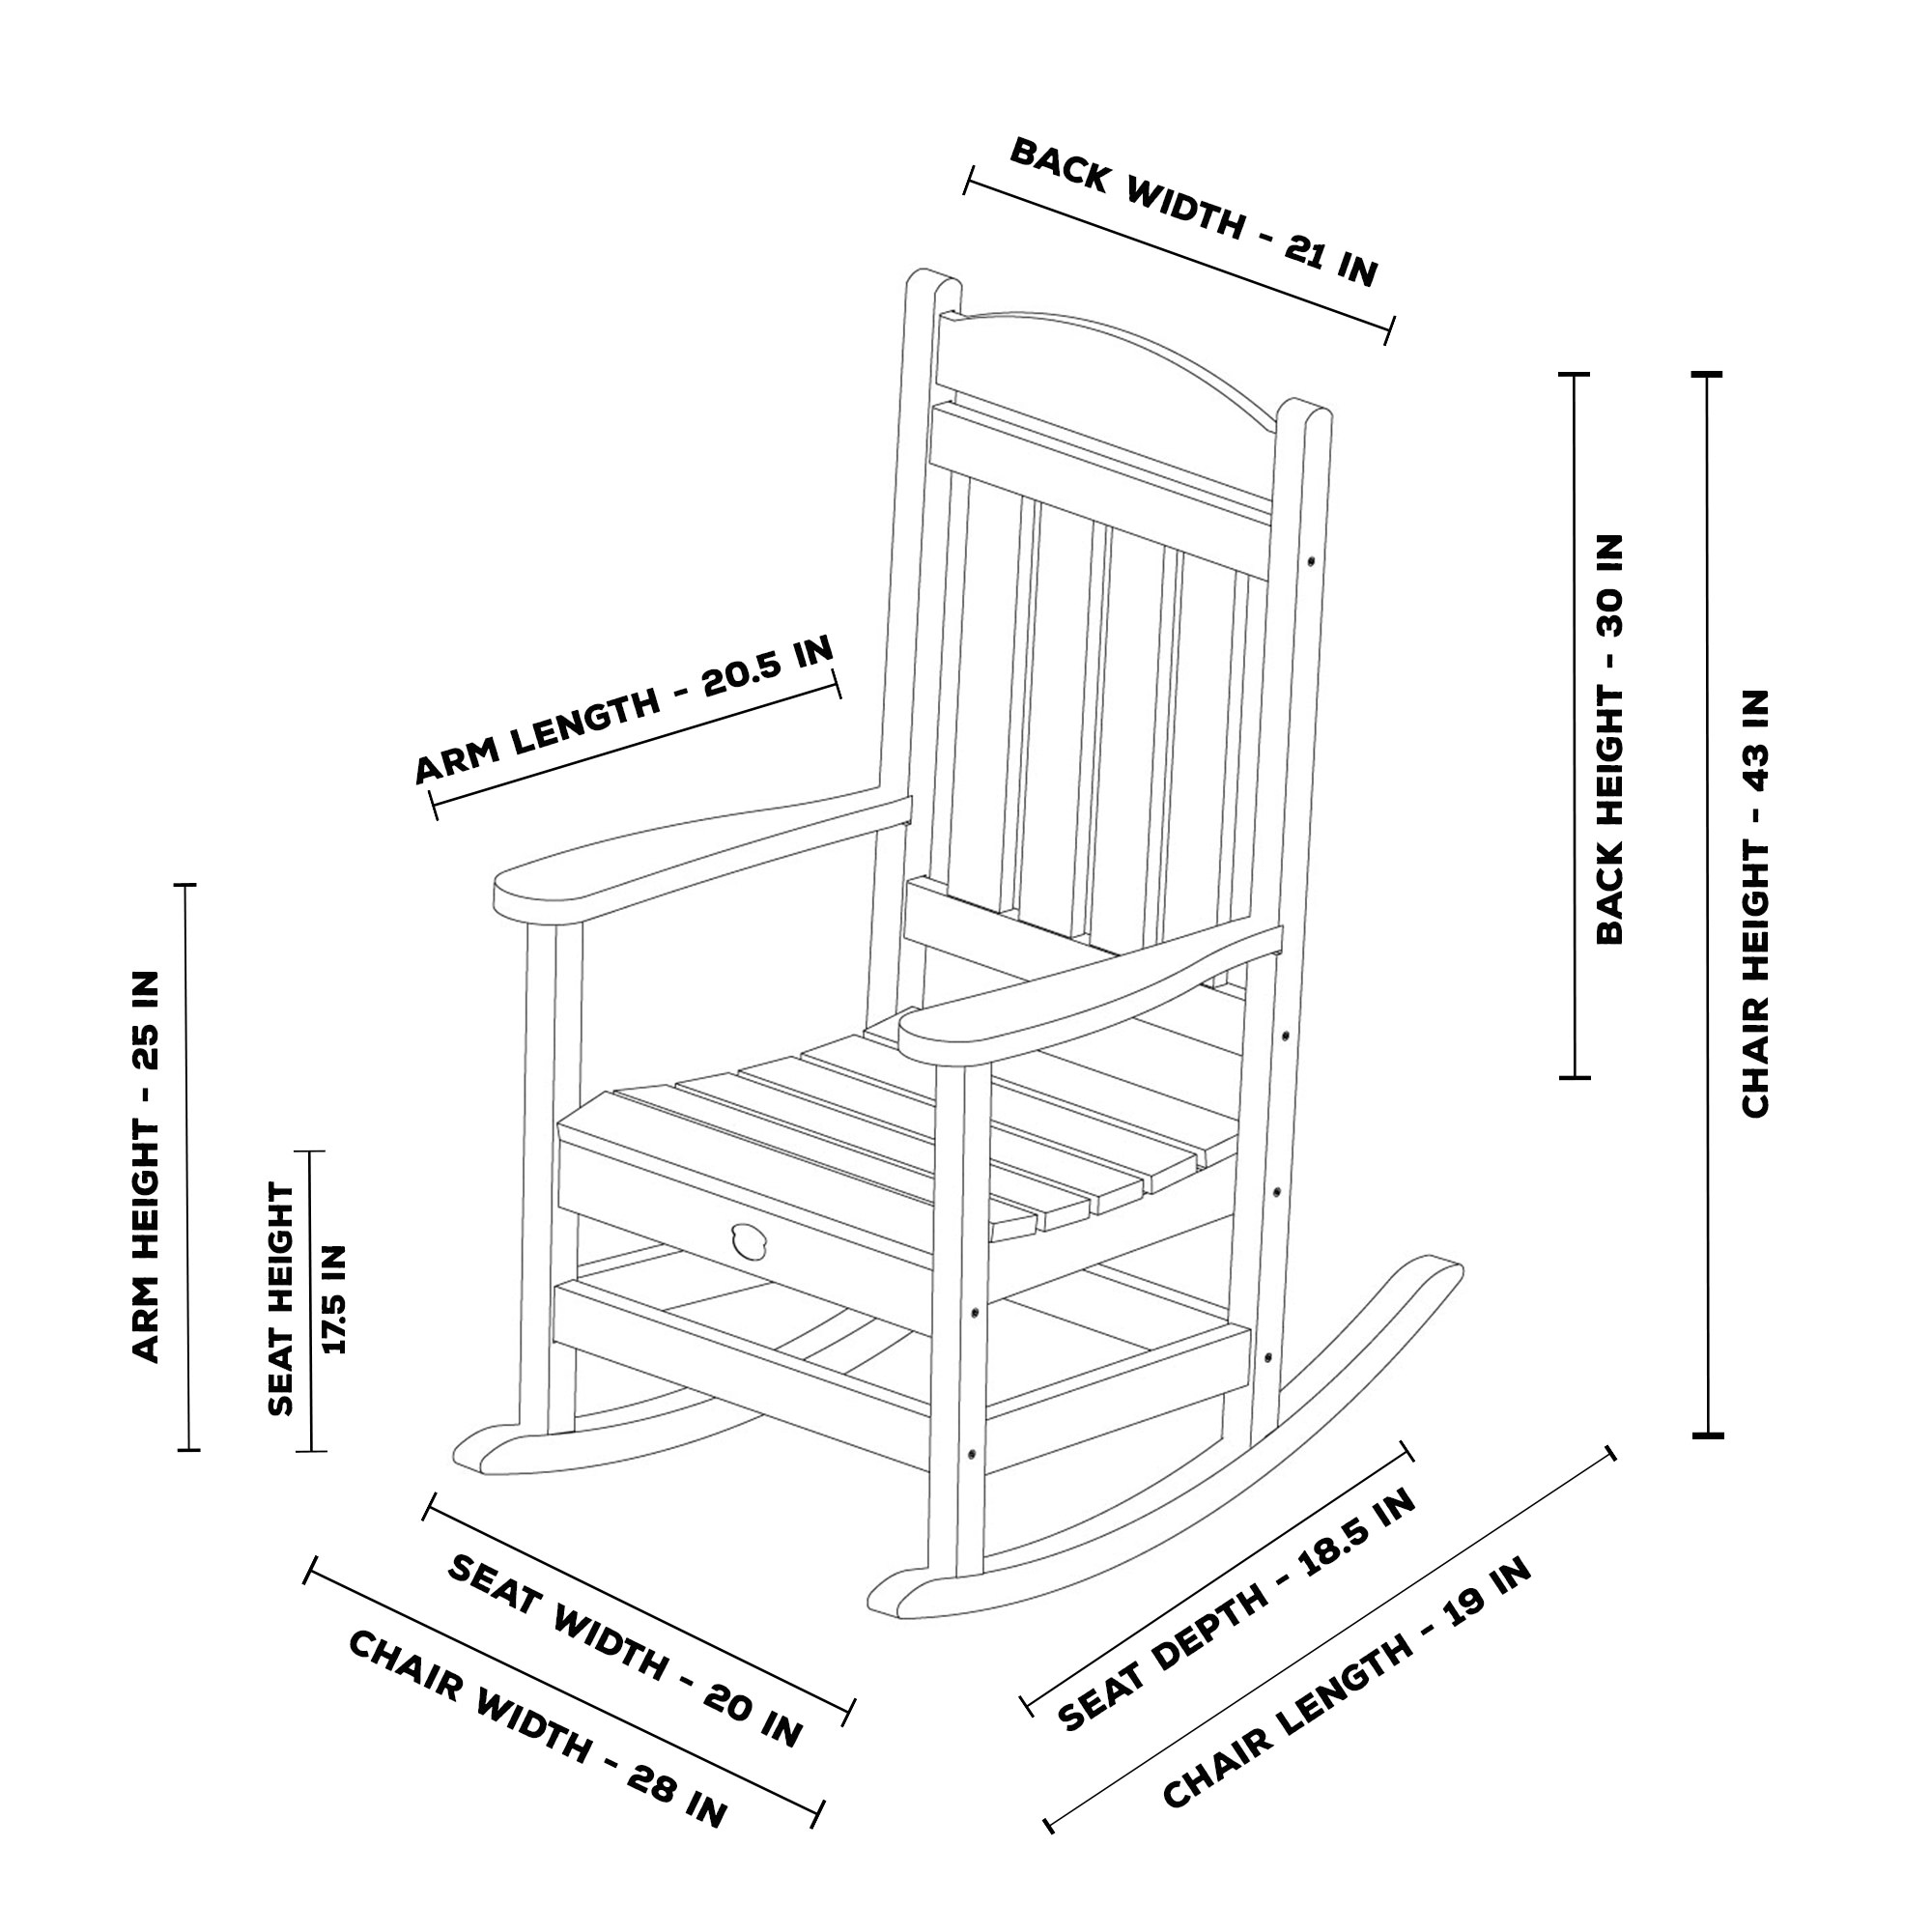 rocking chair height parsons dining room chairs durawood porch rocker pawleys island hammocks